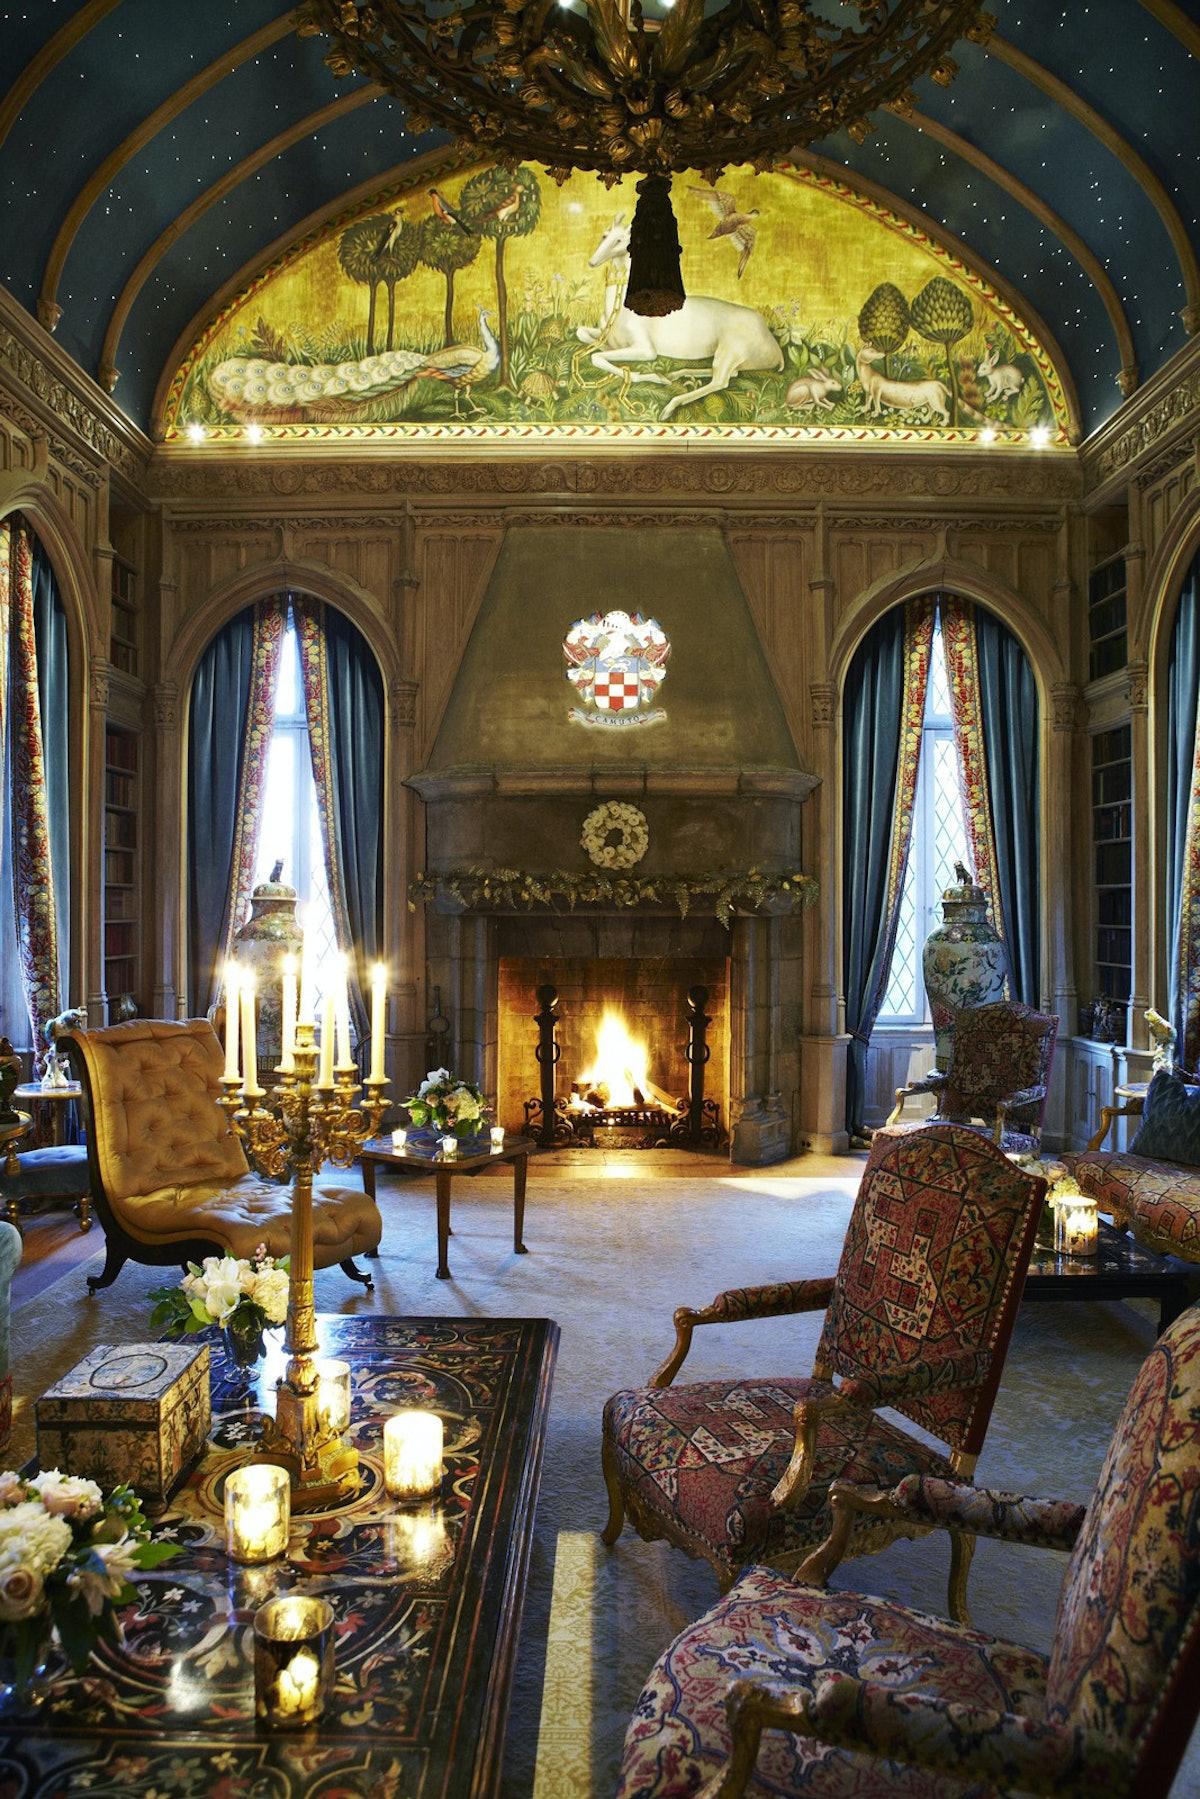 Vince Camuto's Chateau Ridge home